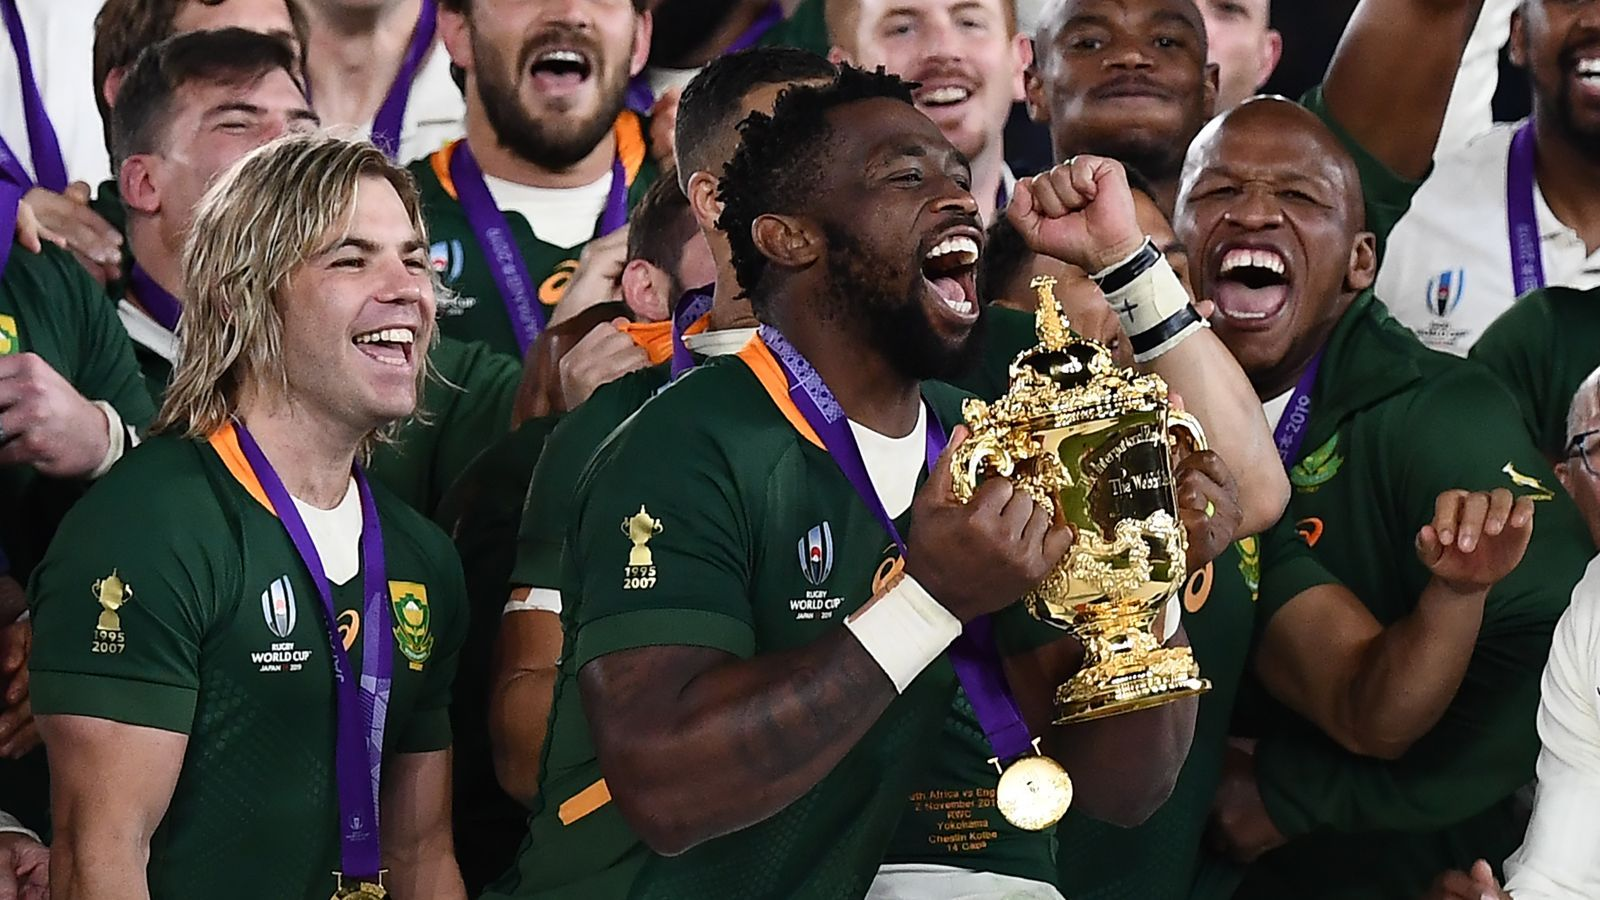 Siya Kolisi The First Black Man To Lead South Africa To Rugby World Cup Glory Rugby World Cup Siya Kolisi Rugby